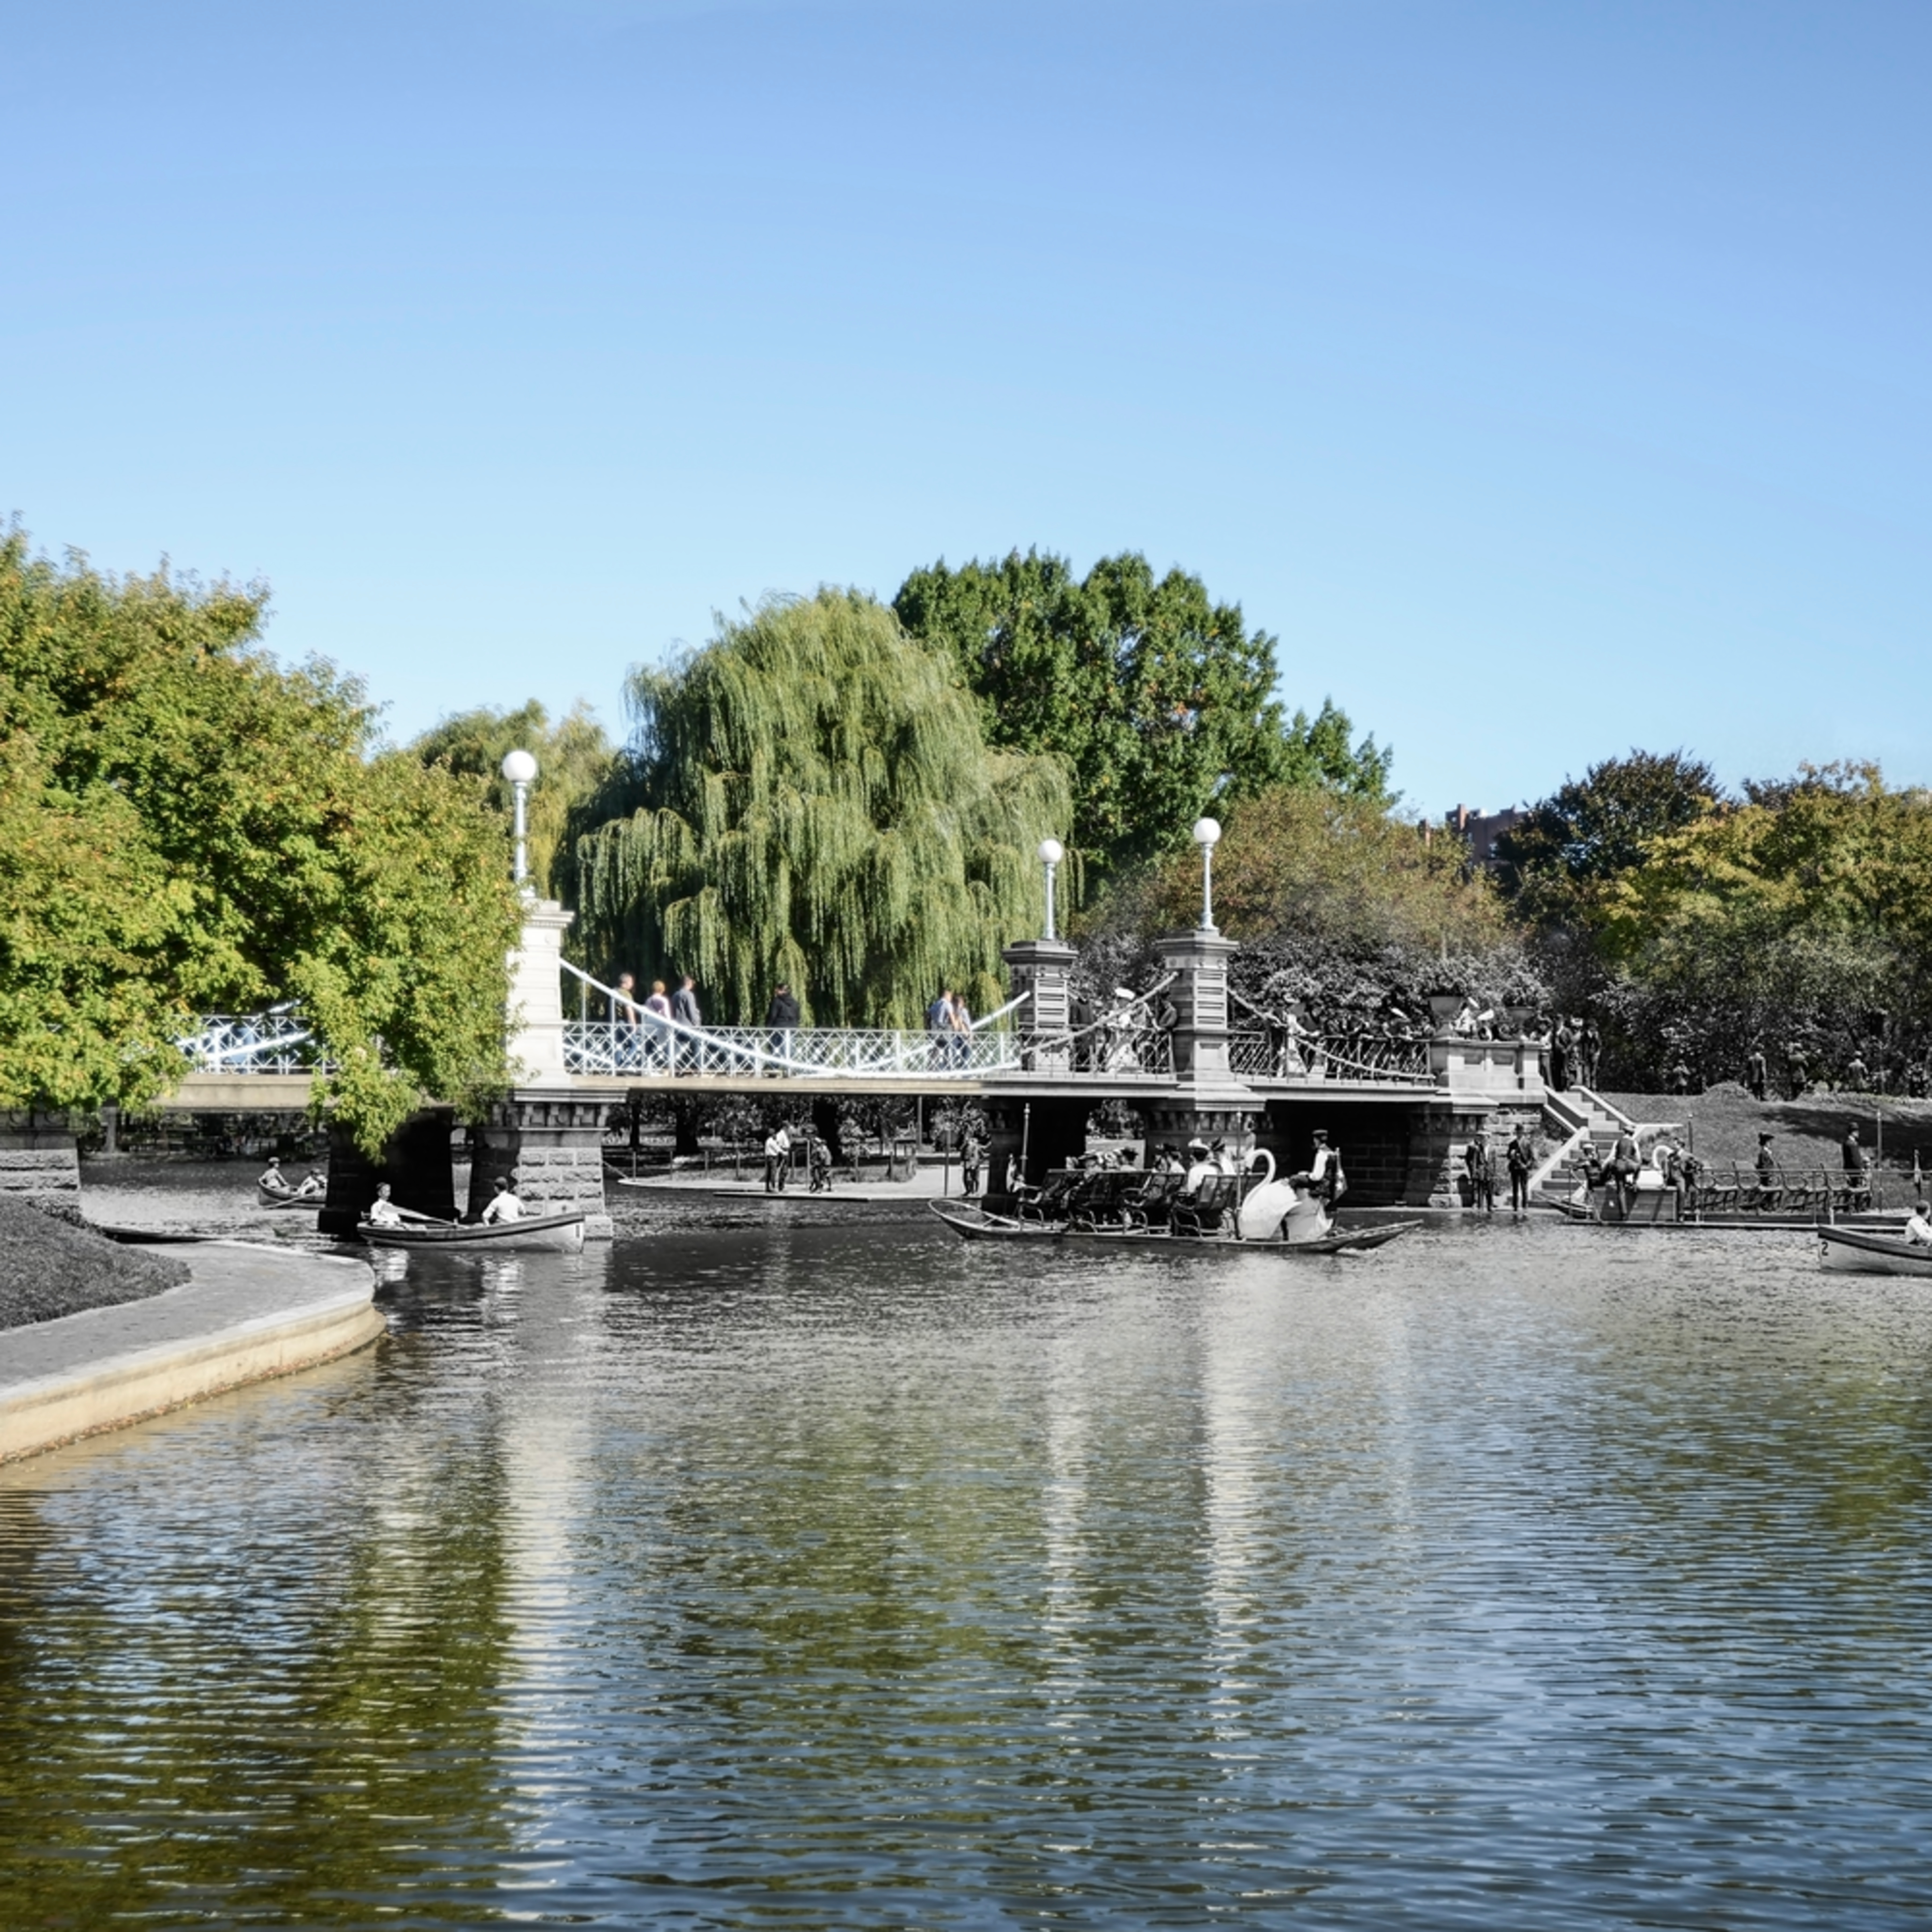 Dsc 8728 bridge public garden boston mass. 32x24 ljoxdz